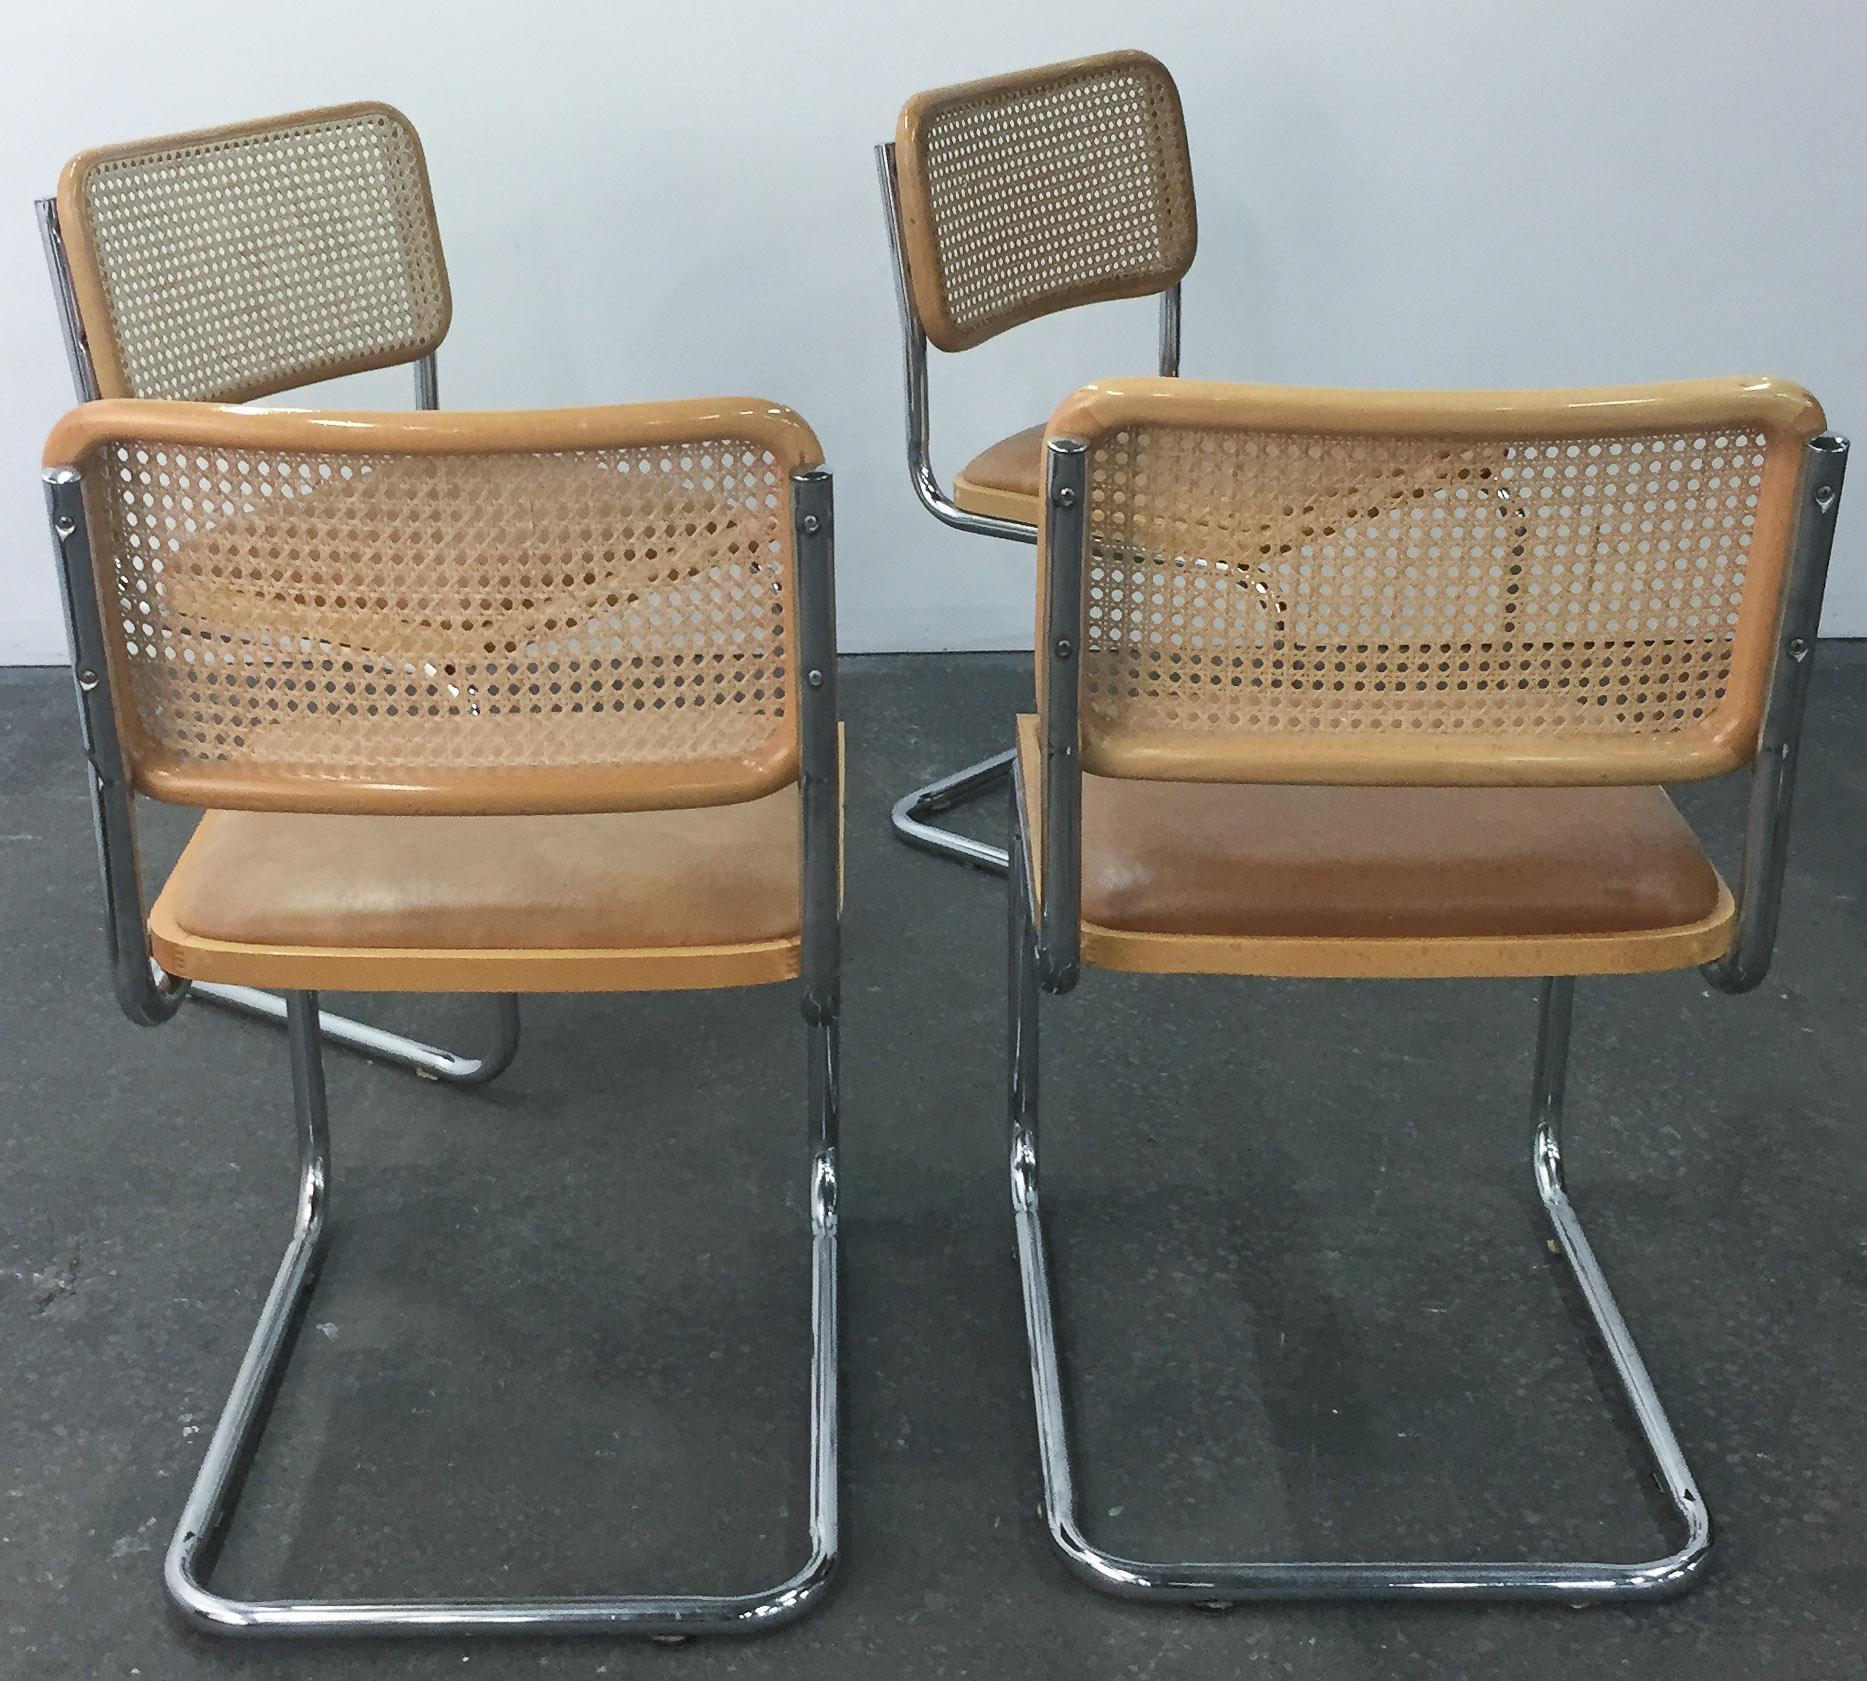 Vintage Breuer Cesca Style Chrome U0026 Cane Chairs   Set Of 4   Image 4 Of